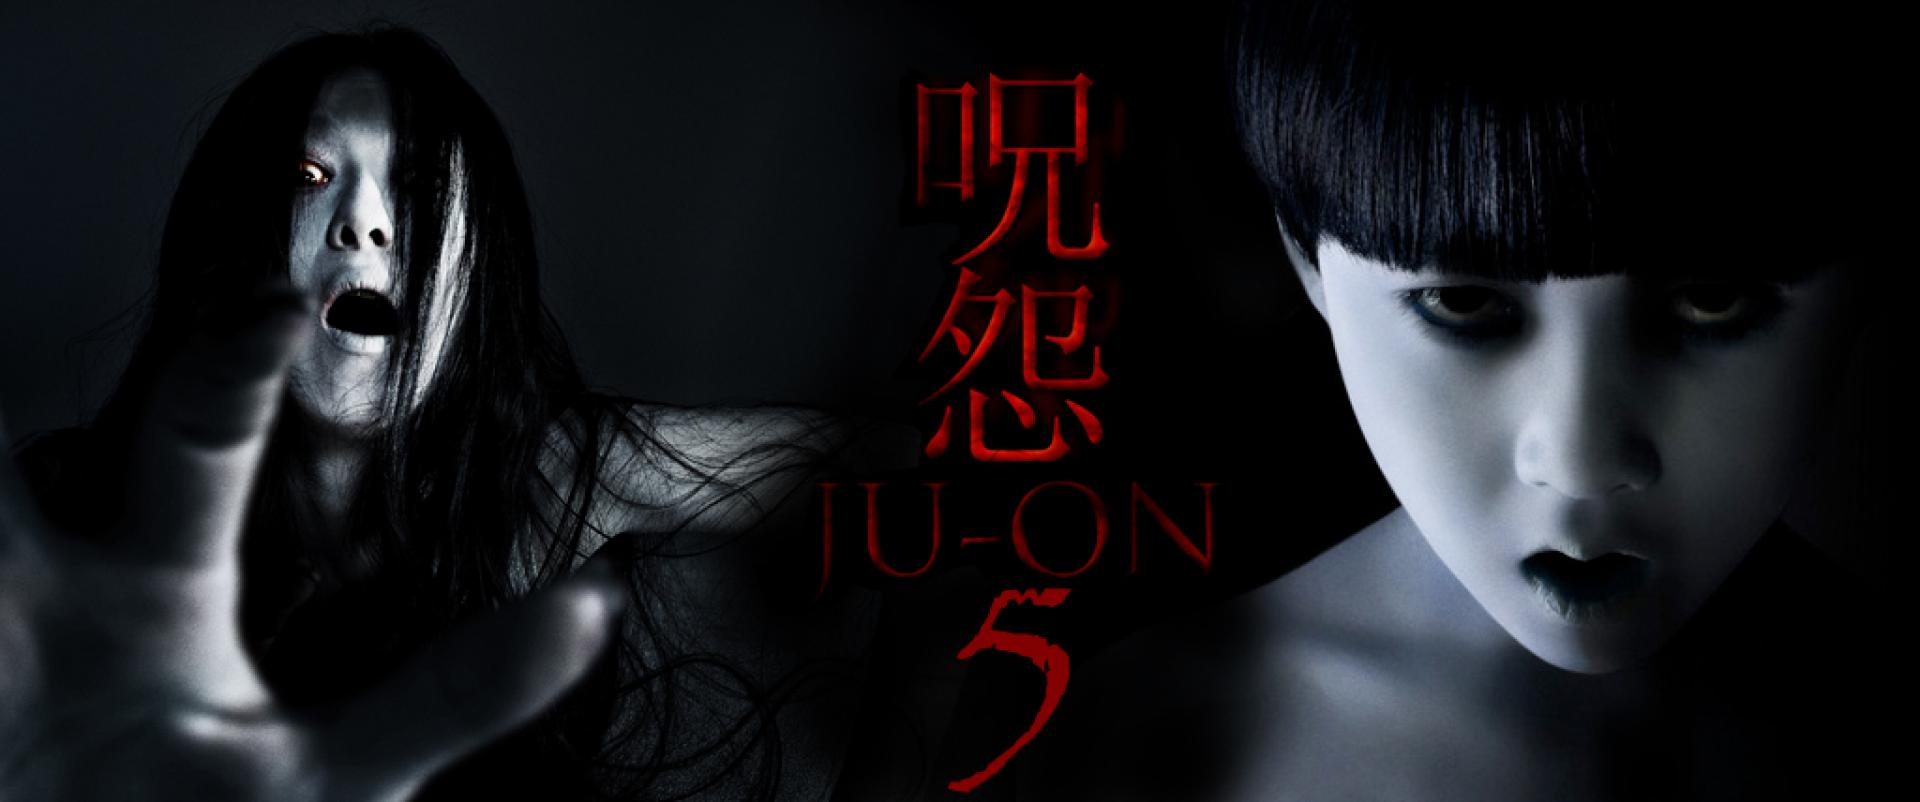 Ju-on Part 5 (2014)